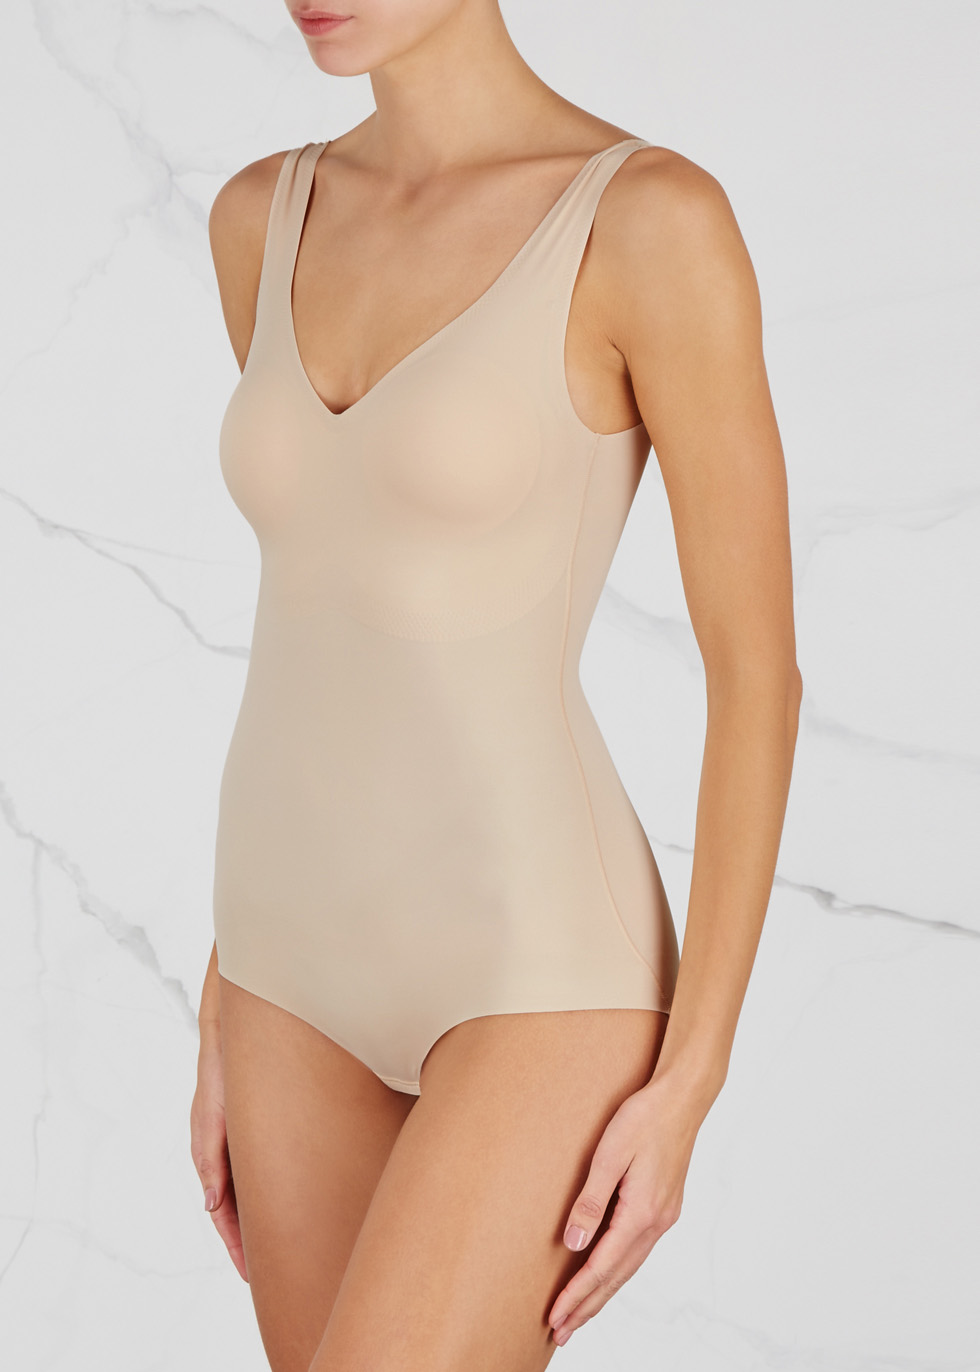 Beyond Naked shaping bodysuit - Wacoal